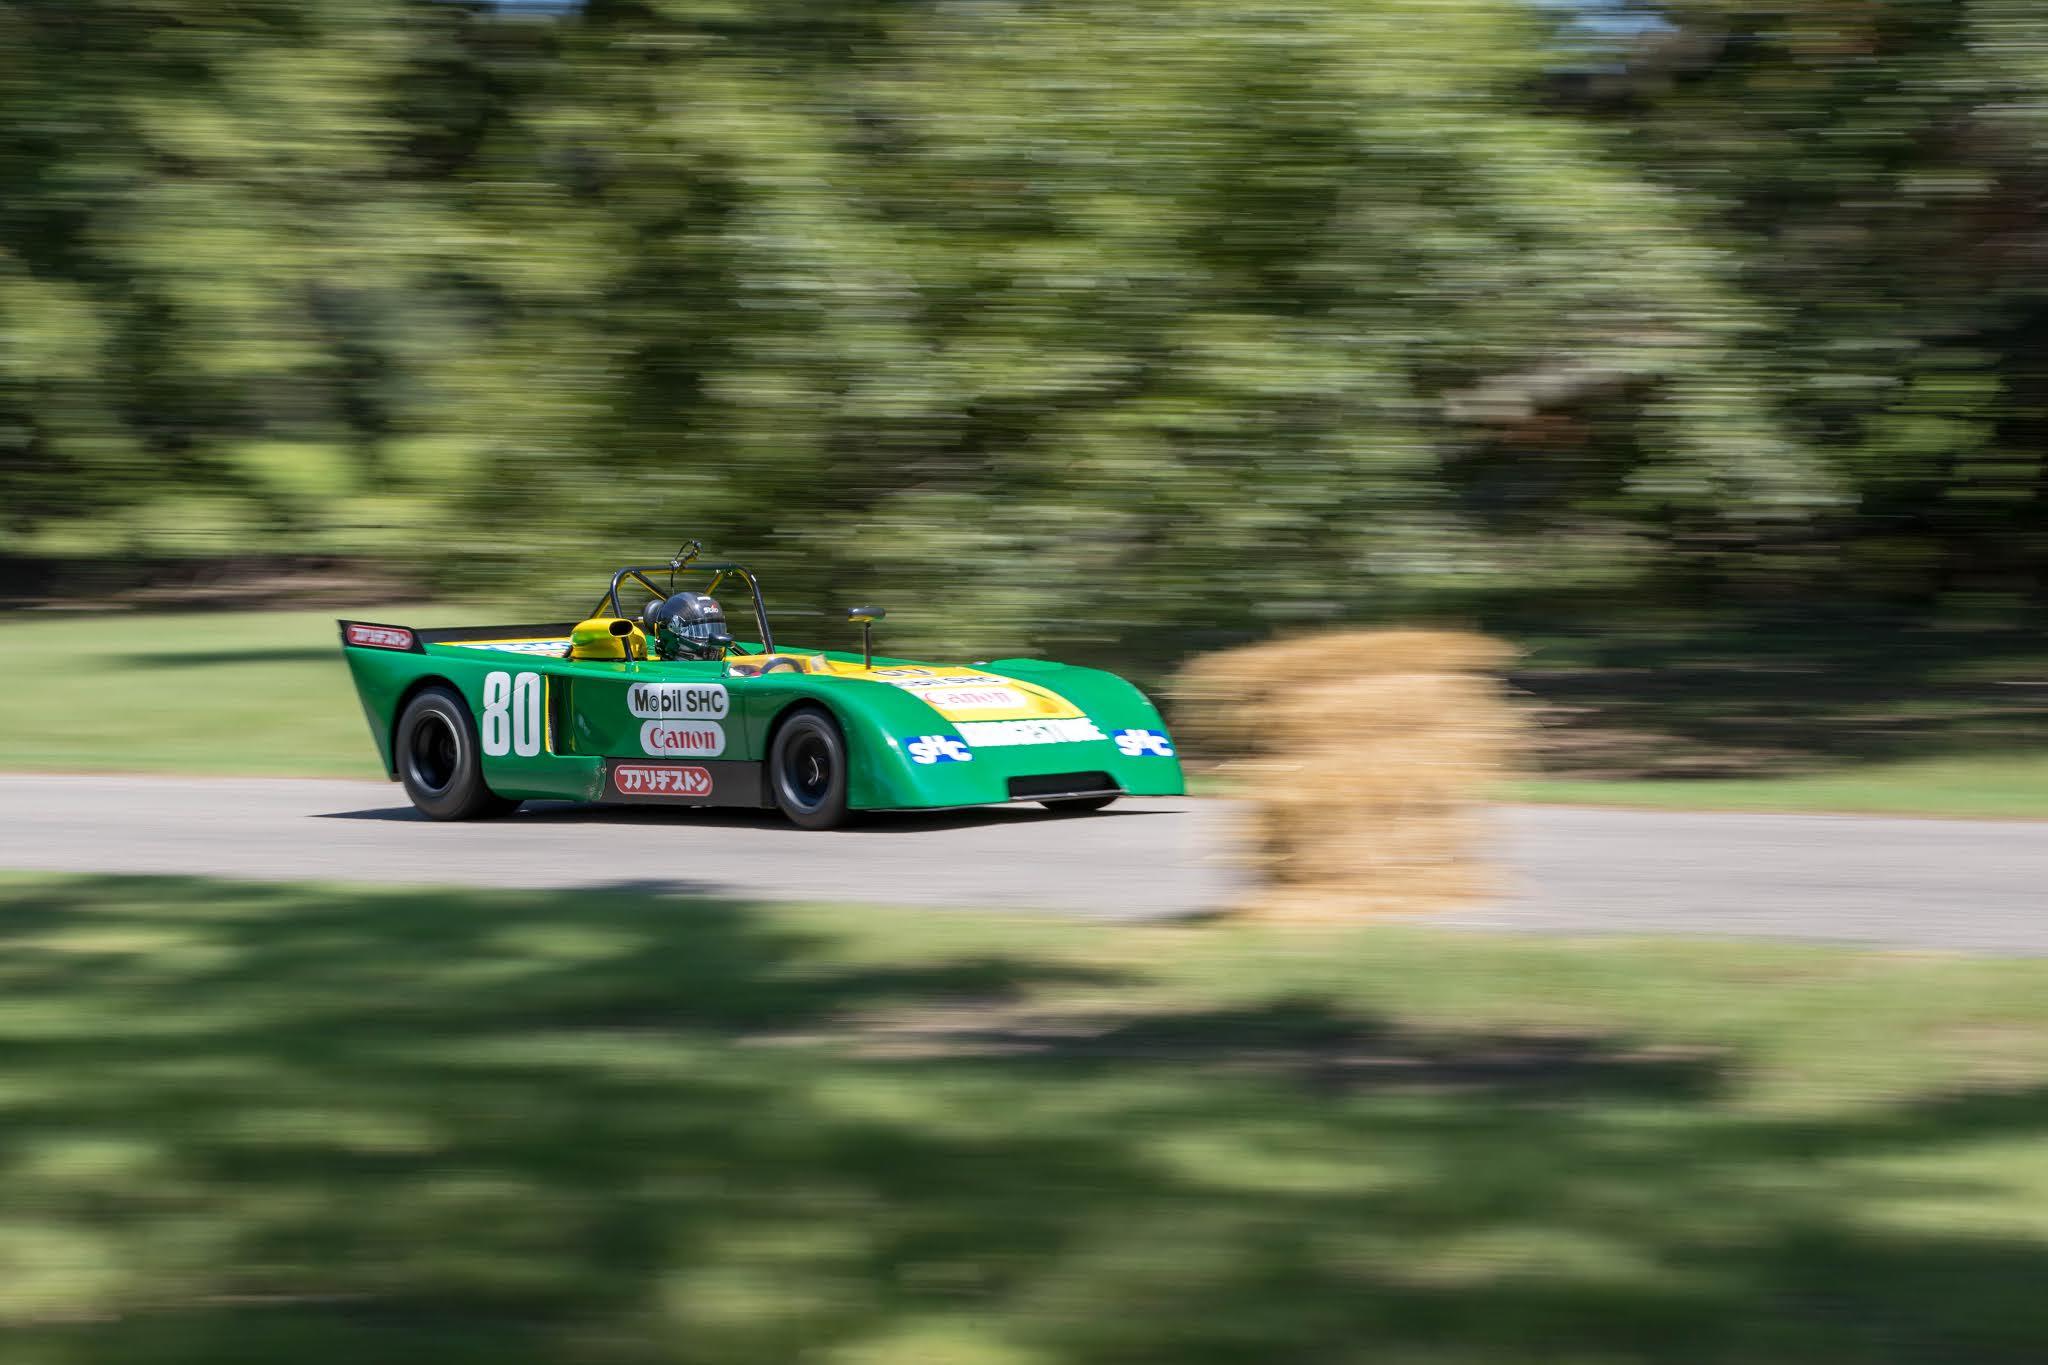 Groesbeck Grand Prix™ Announces 2021 Dates